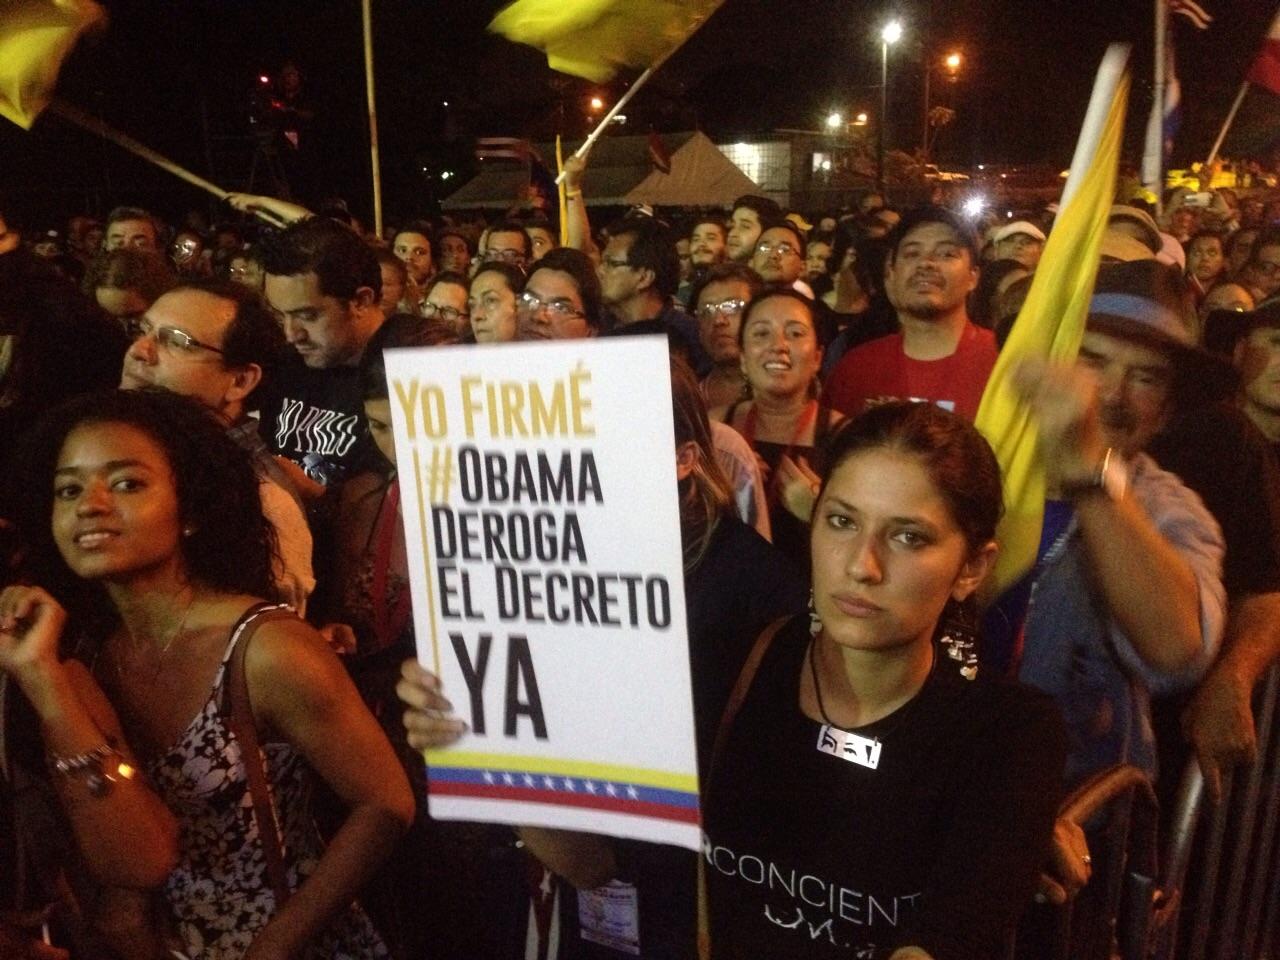 Foto: Kisaí Mendoza Meléndez